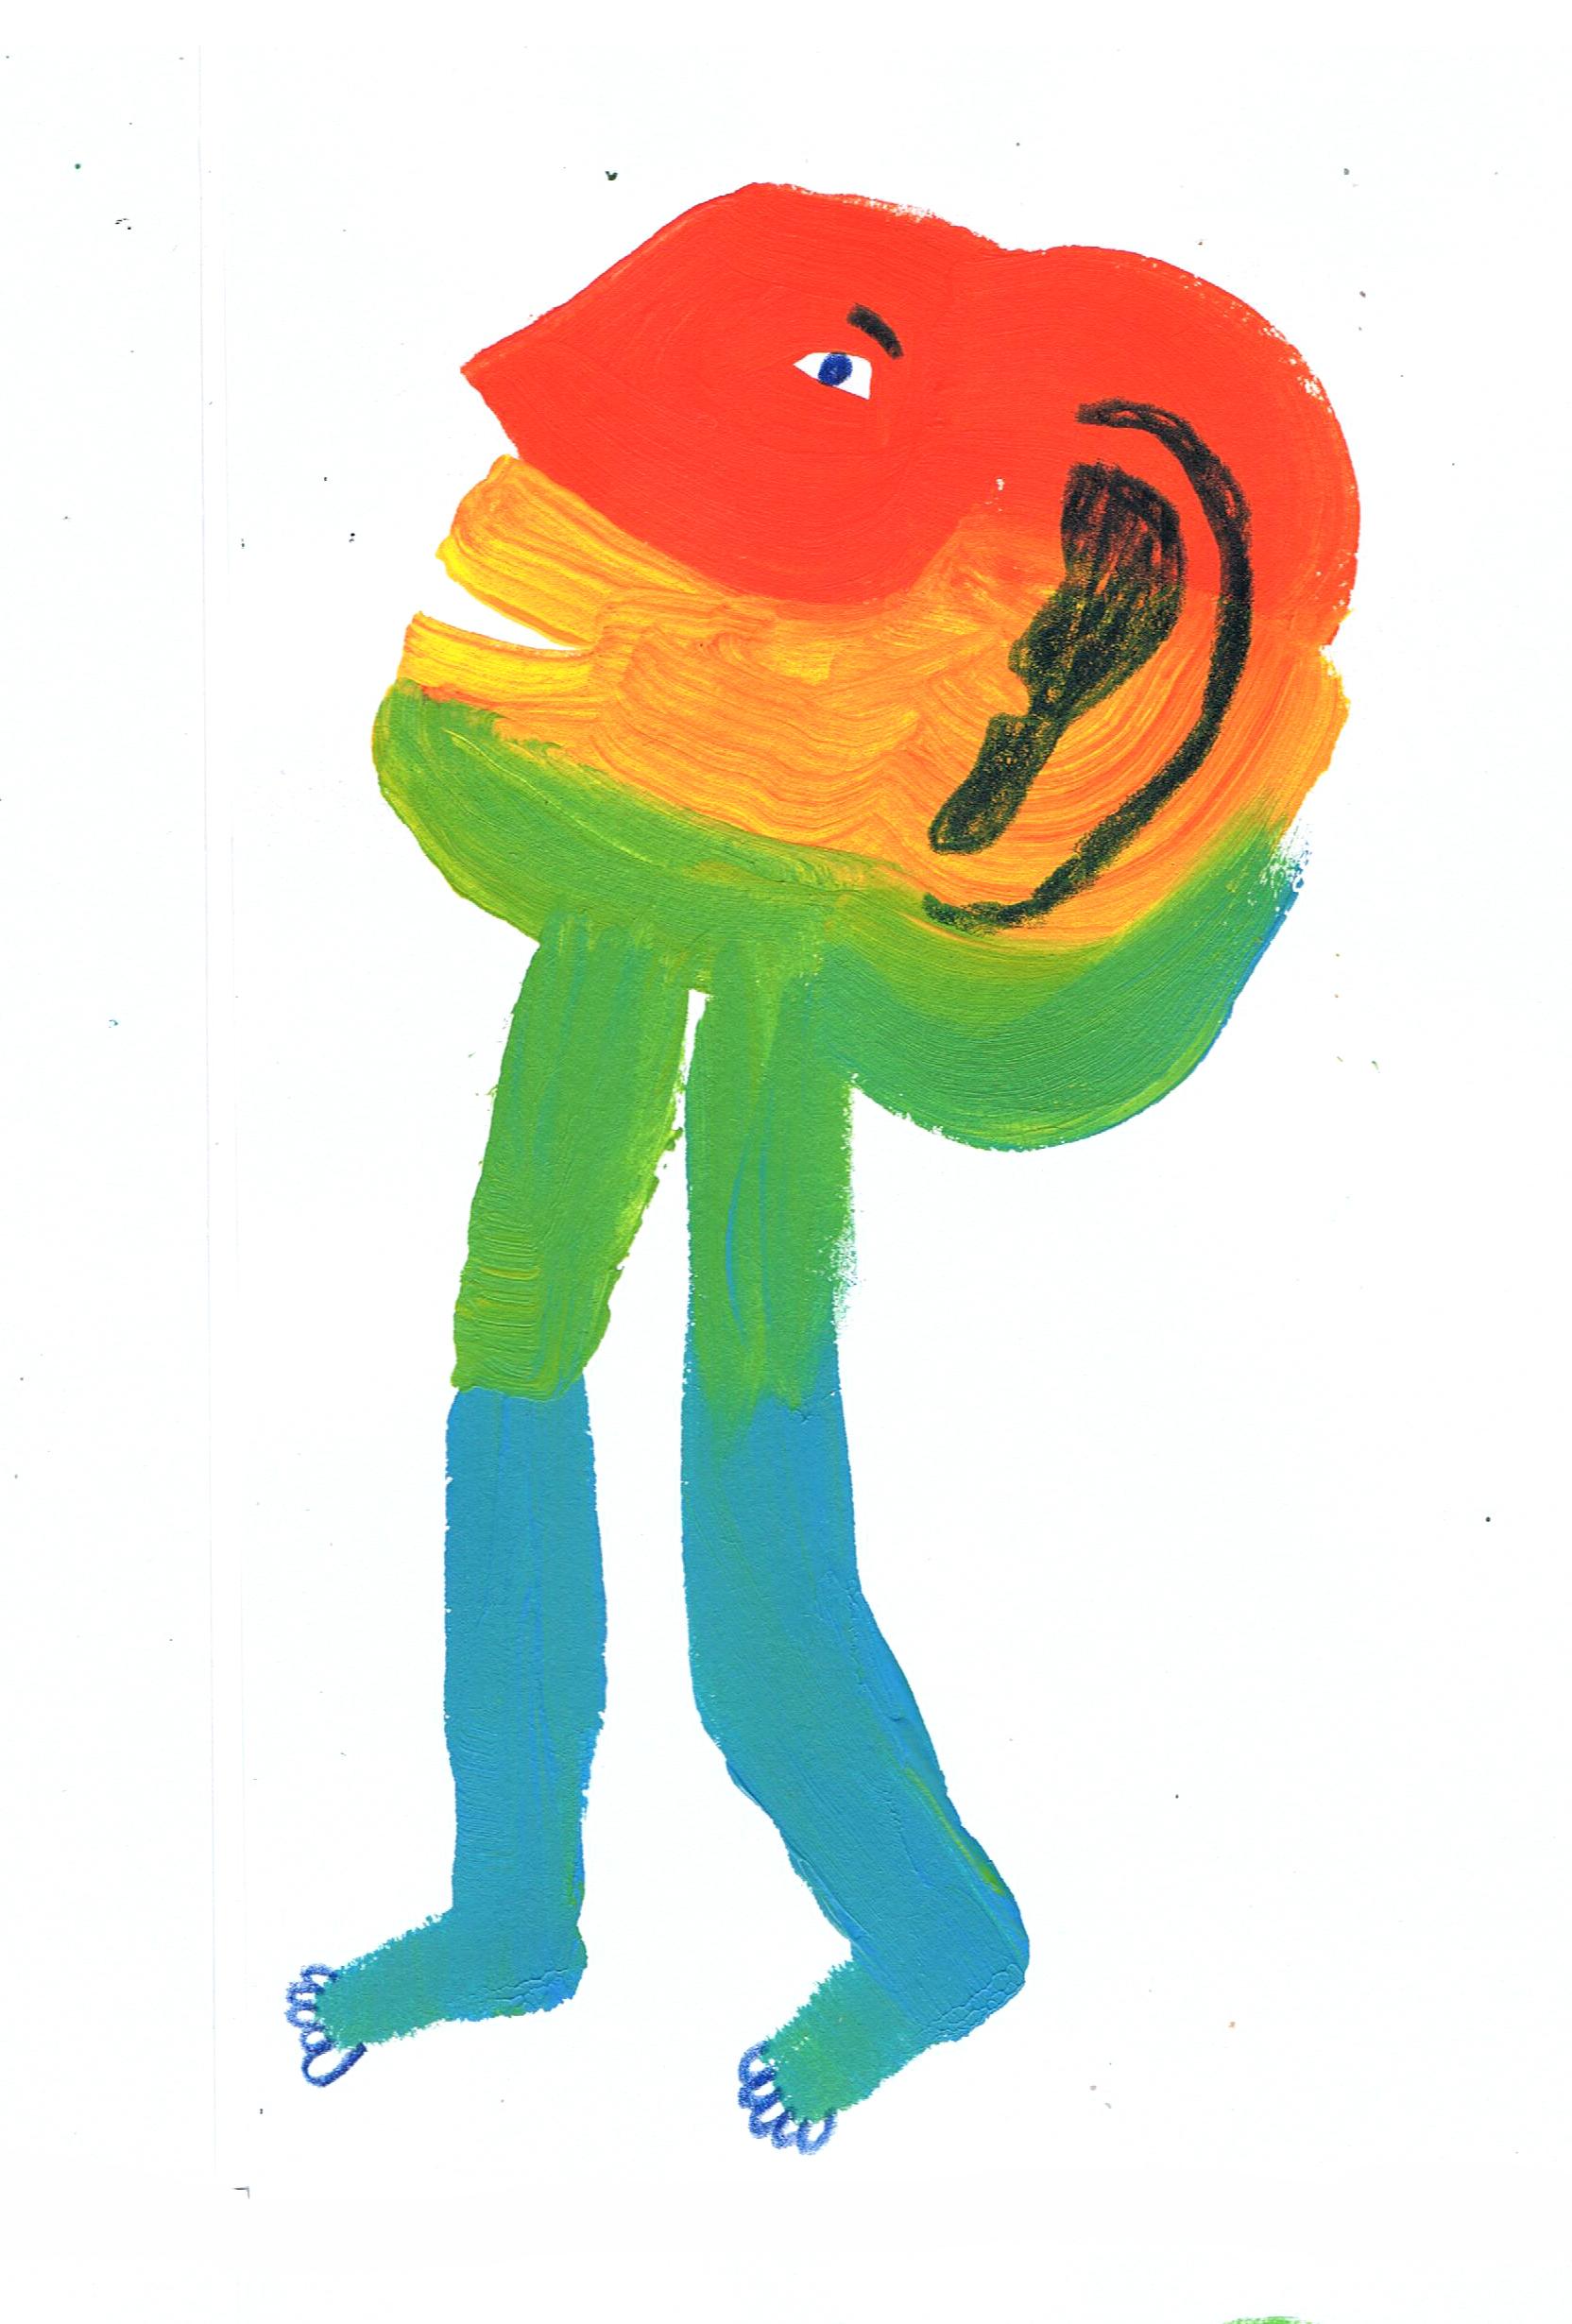 Athena meto kleur.jpg